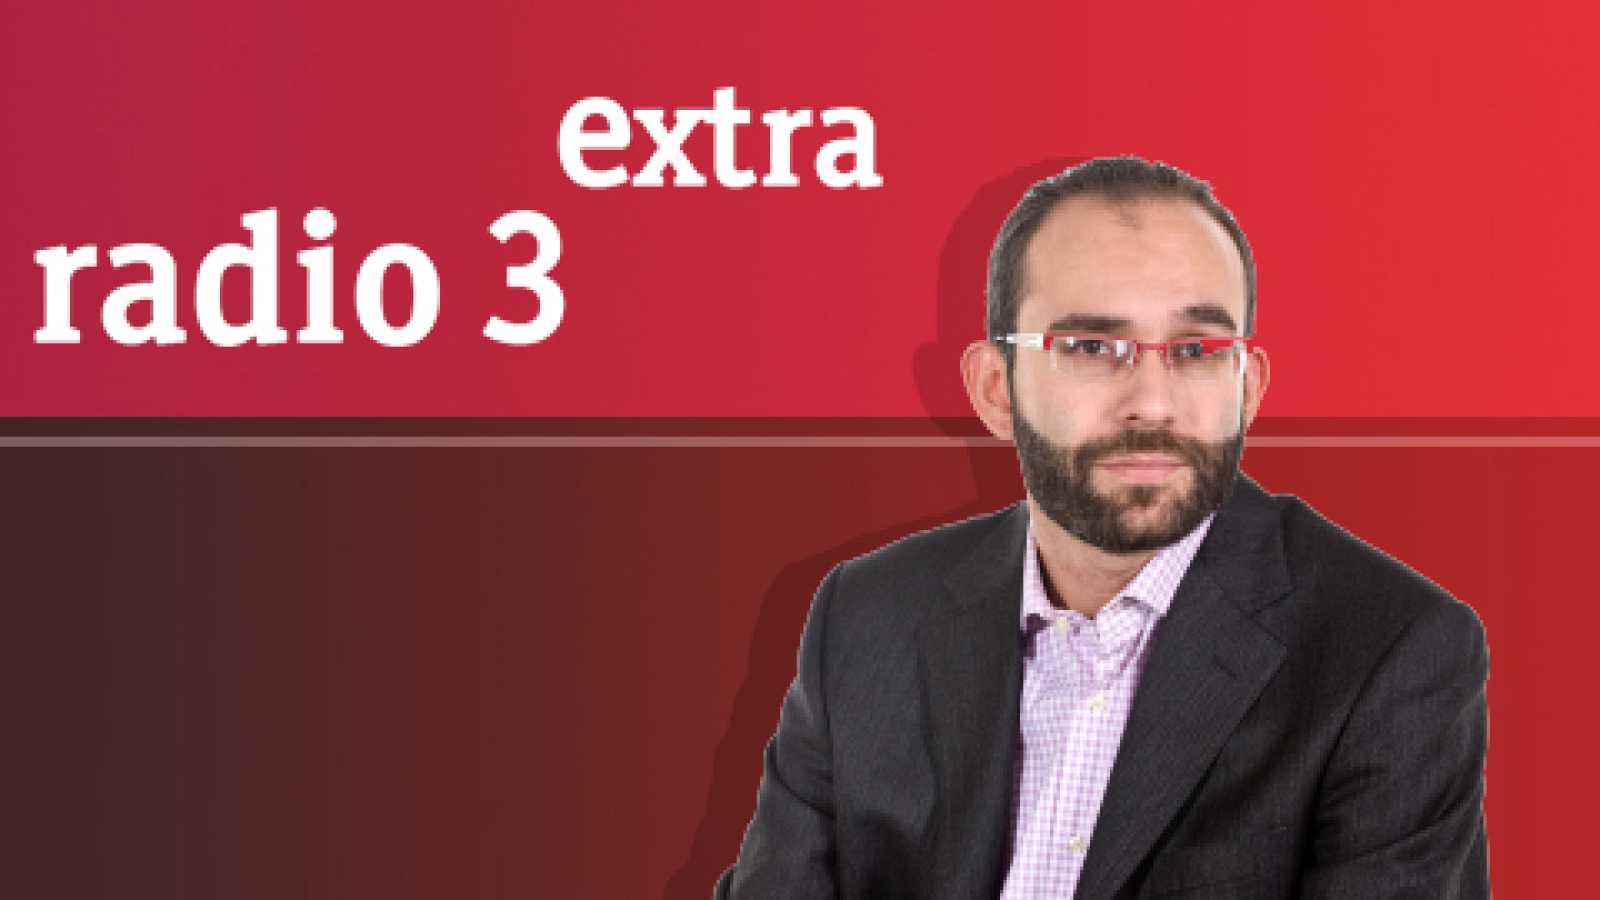 3.0 - Surface 2, ¿por qué tan pronto? -  Escuchar ahora